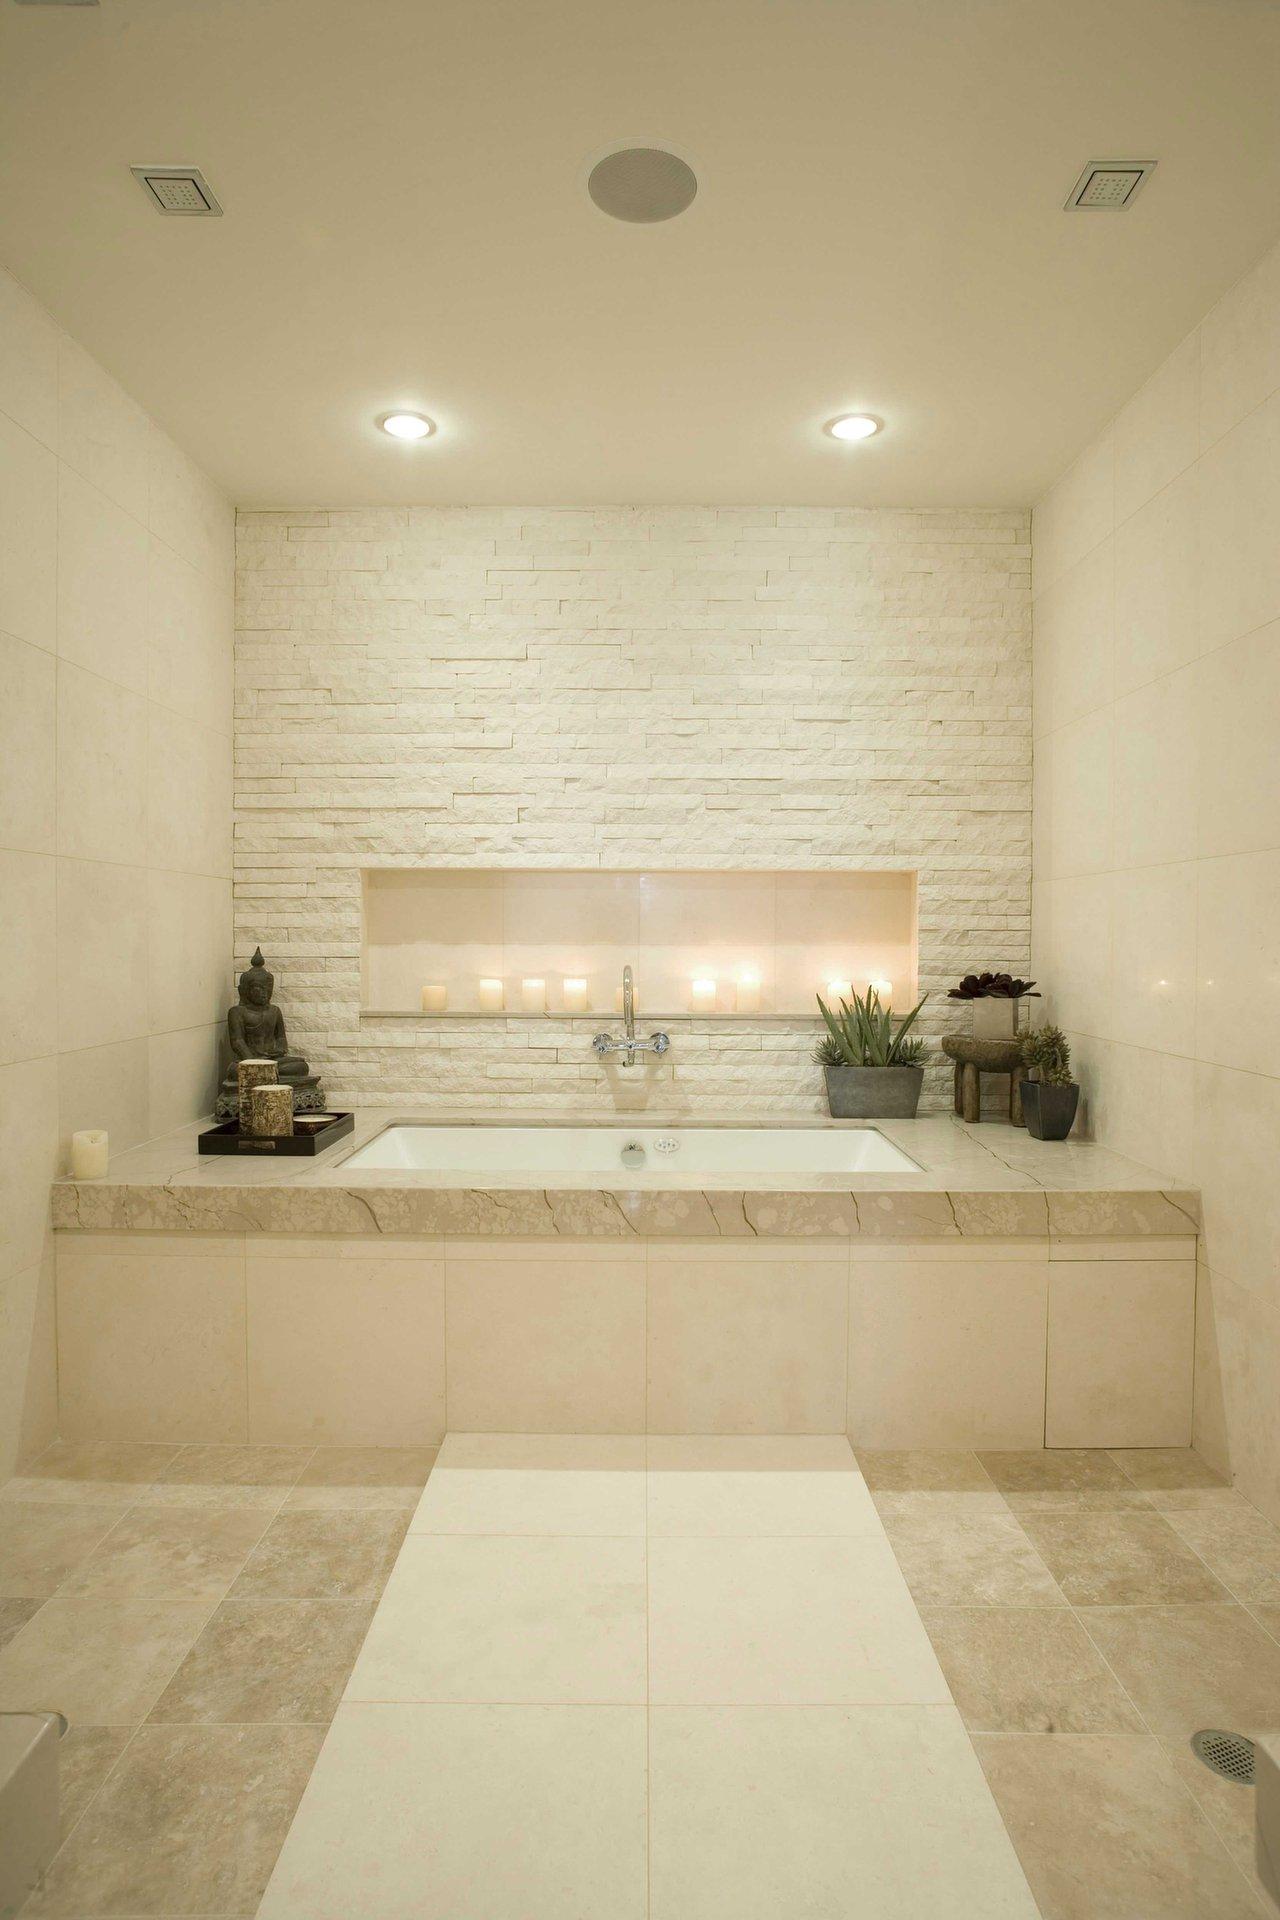 6700 sf Penthouse + 3200 sf Terrace